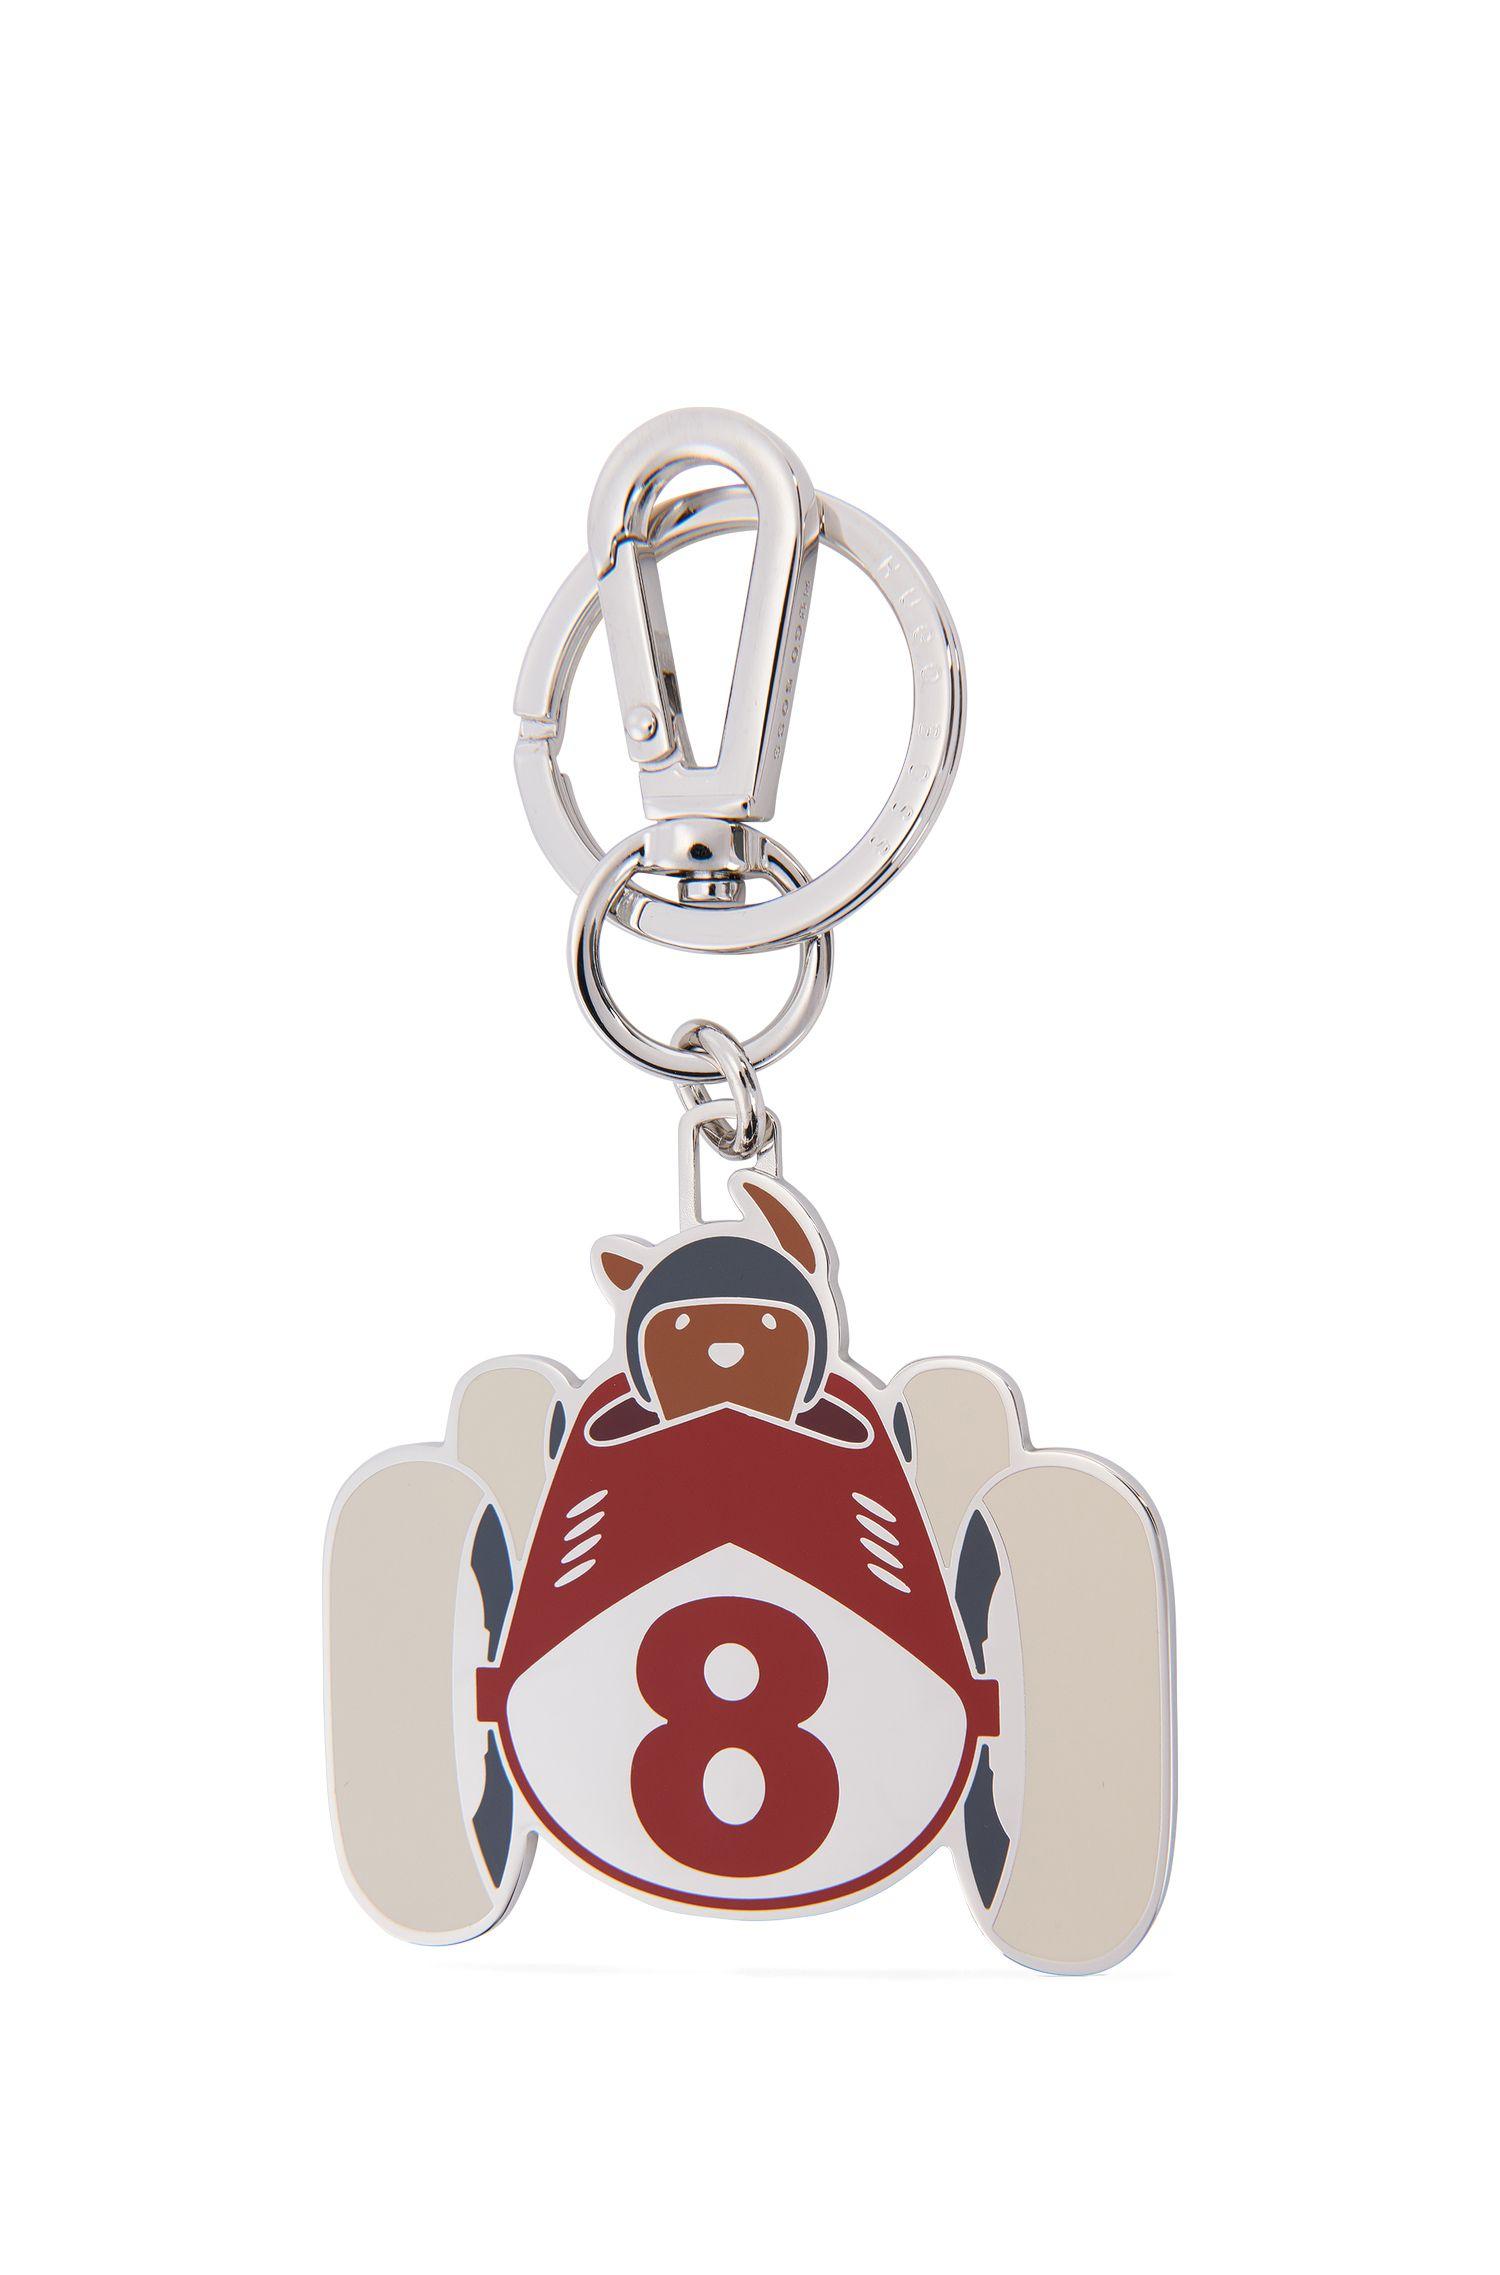 Roadster Key Fob | HB Road Key Fob Dog